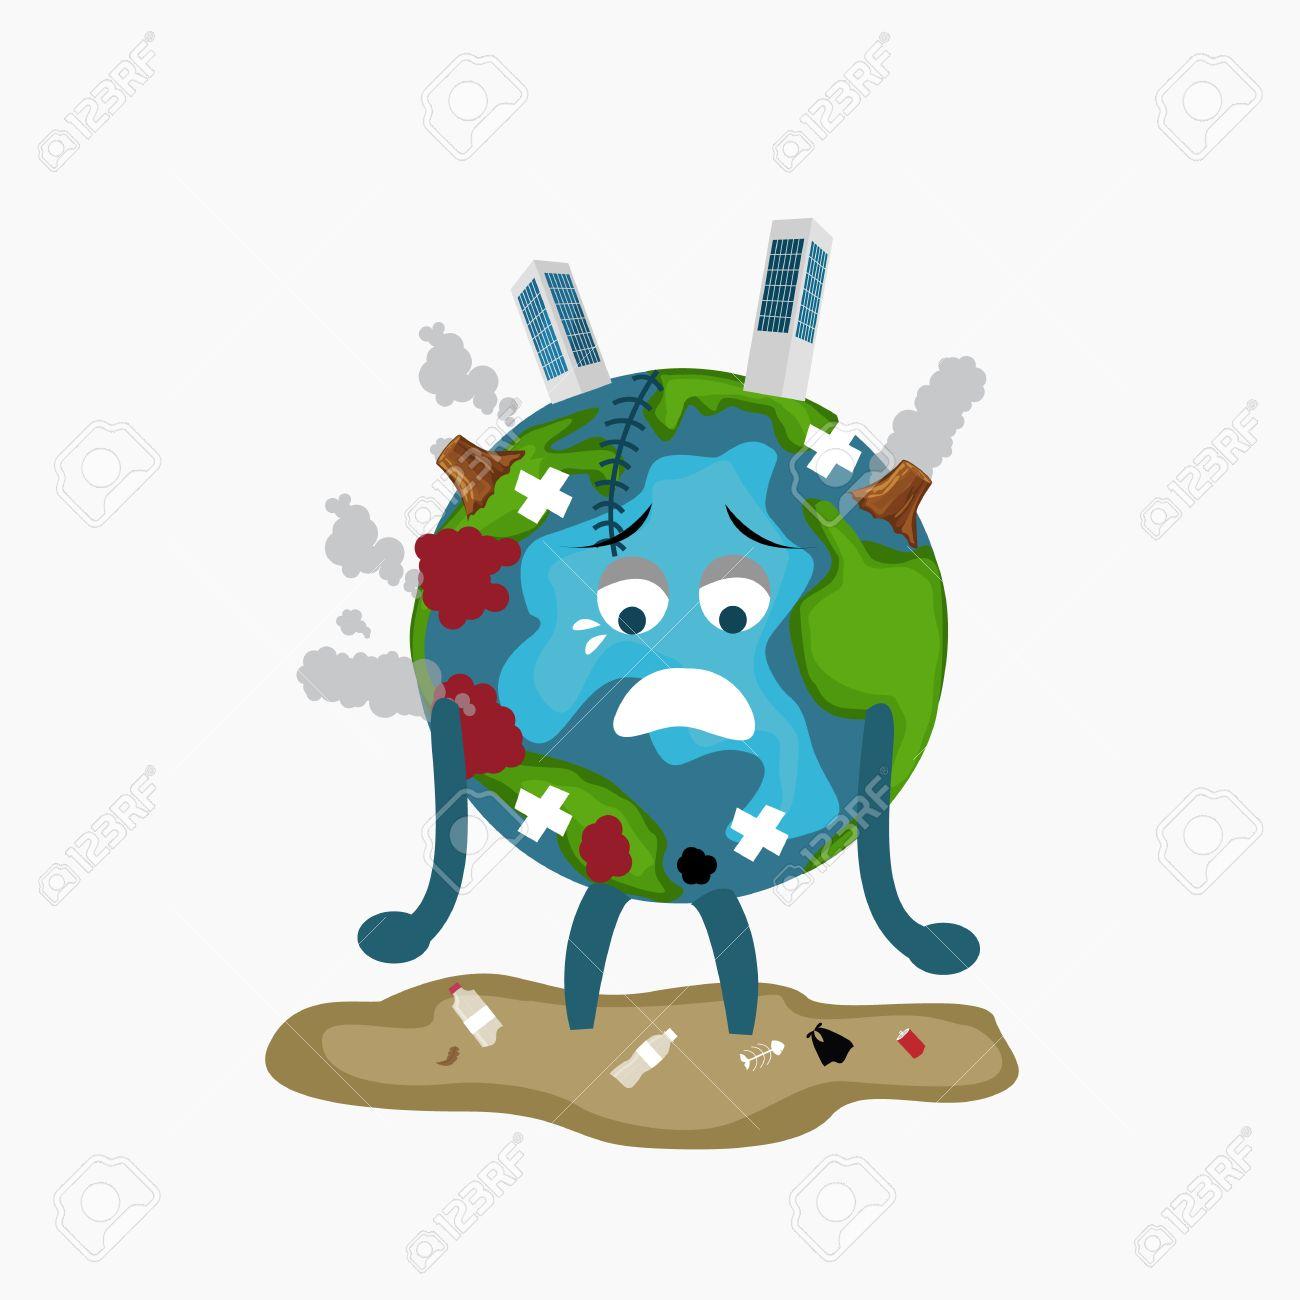 Earth globe sad sick tired of polution global warming deforestation full of dirty garbage environmental damage - 81480860